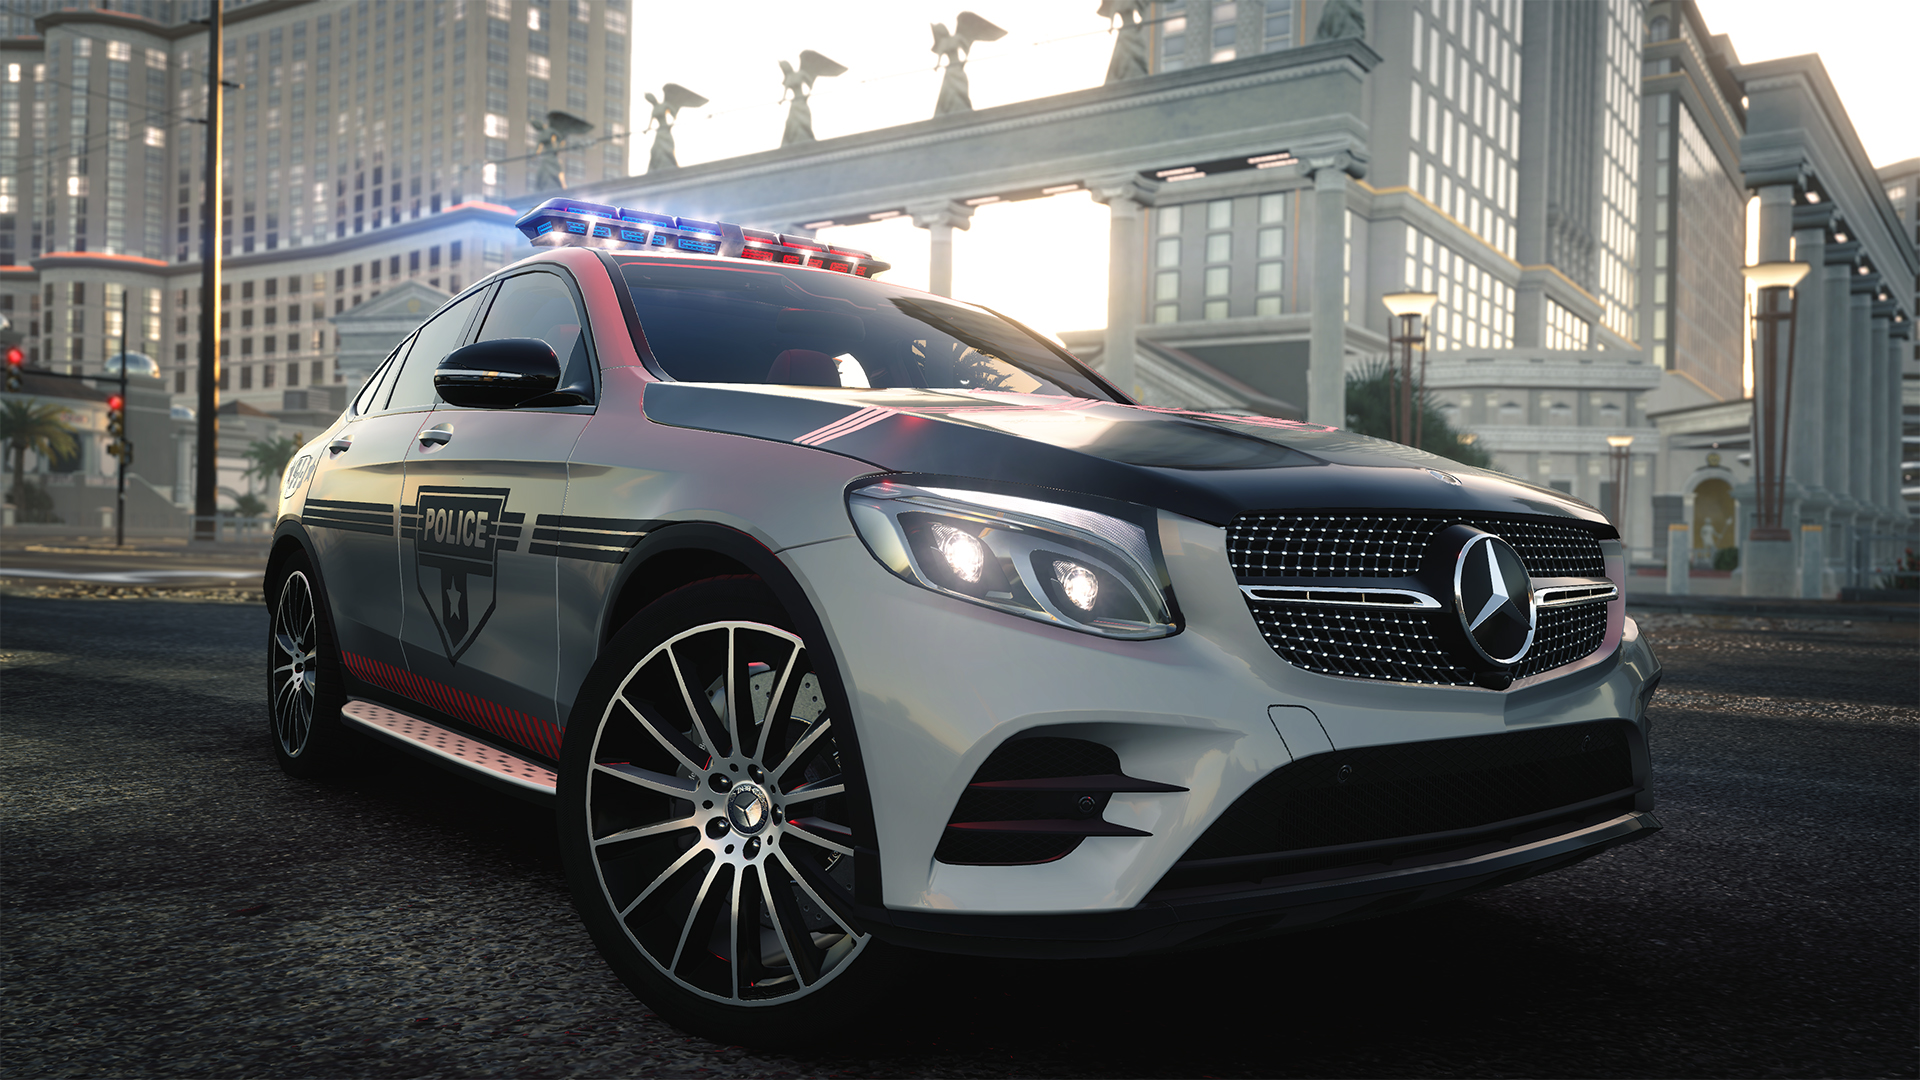 Unlocking Police Vehicles | The Crew 2 | Ubisoft